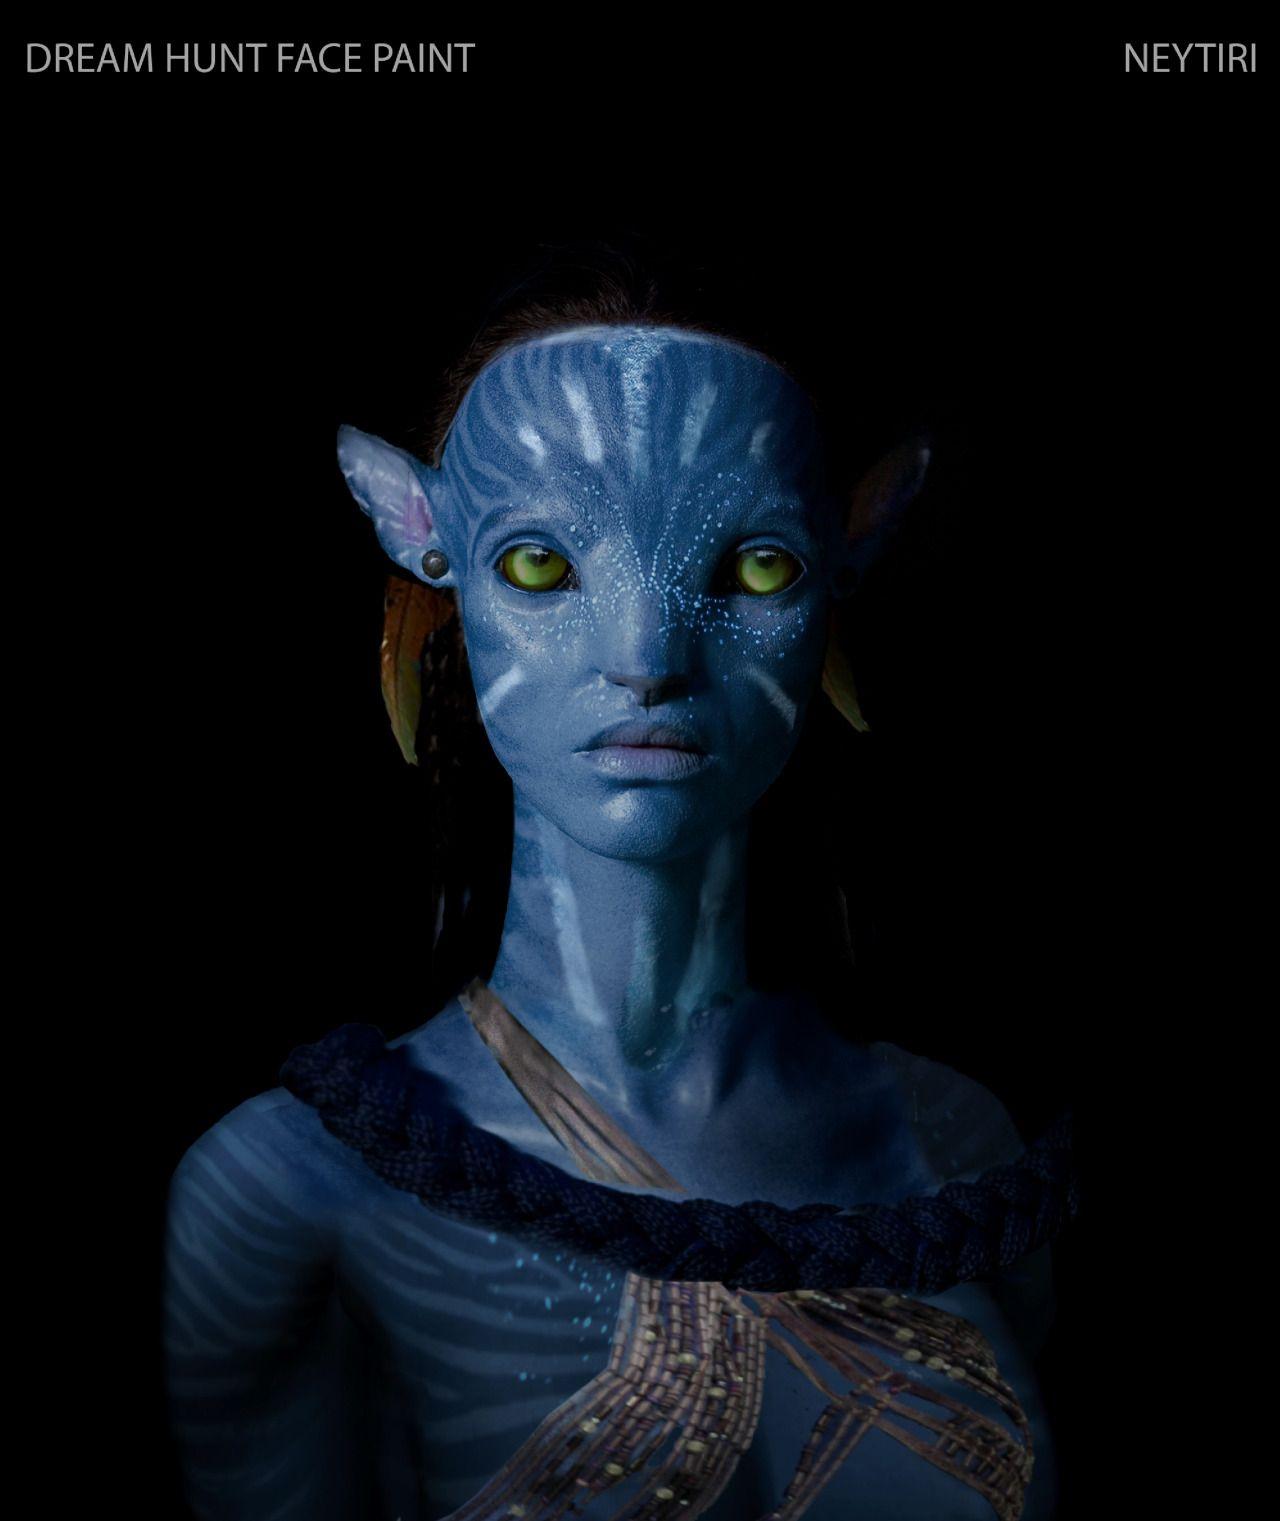 Avatar 2 Movie: Neytiri Face Paint Concept Art.